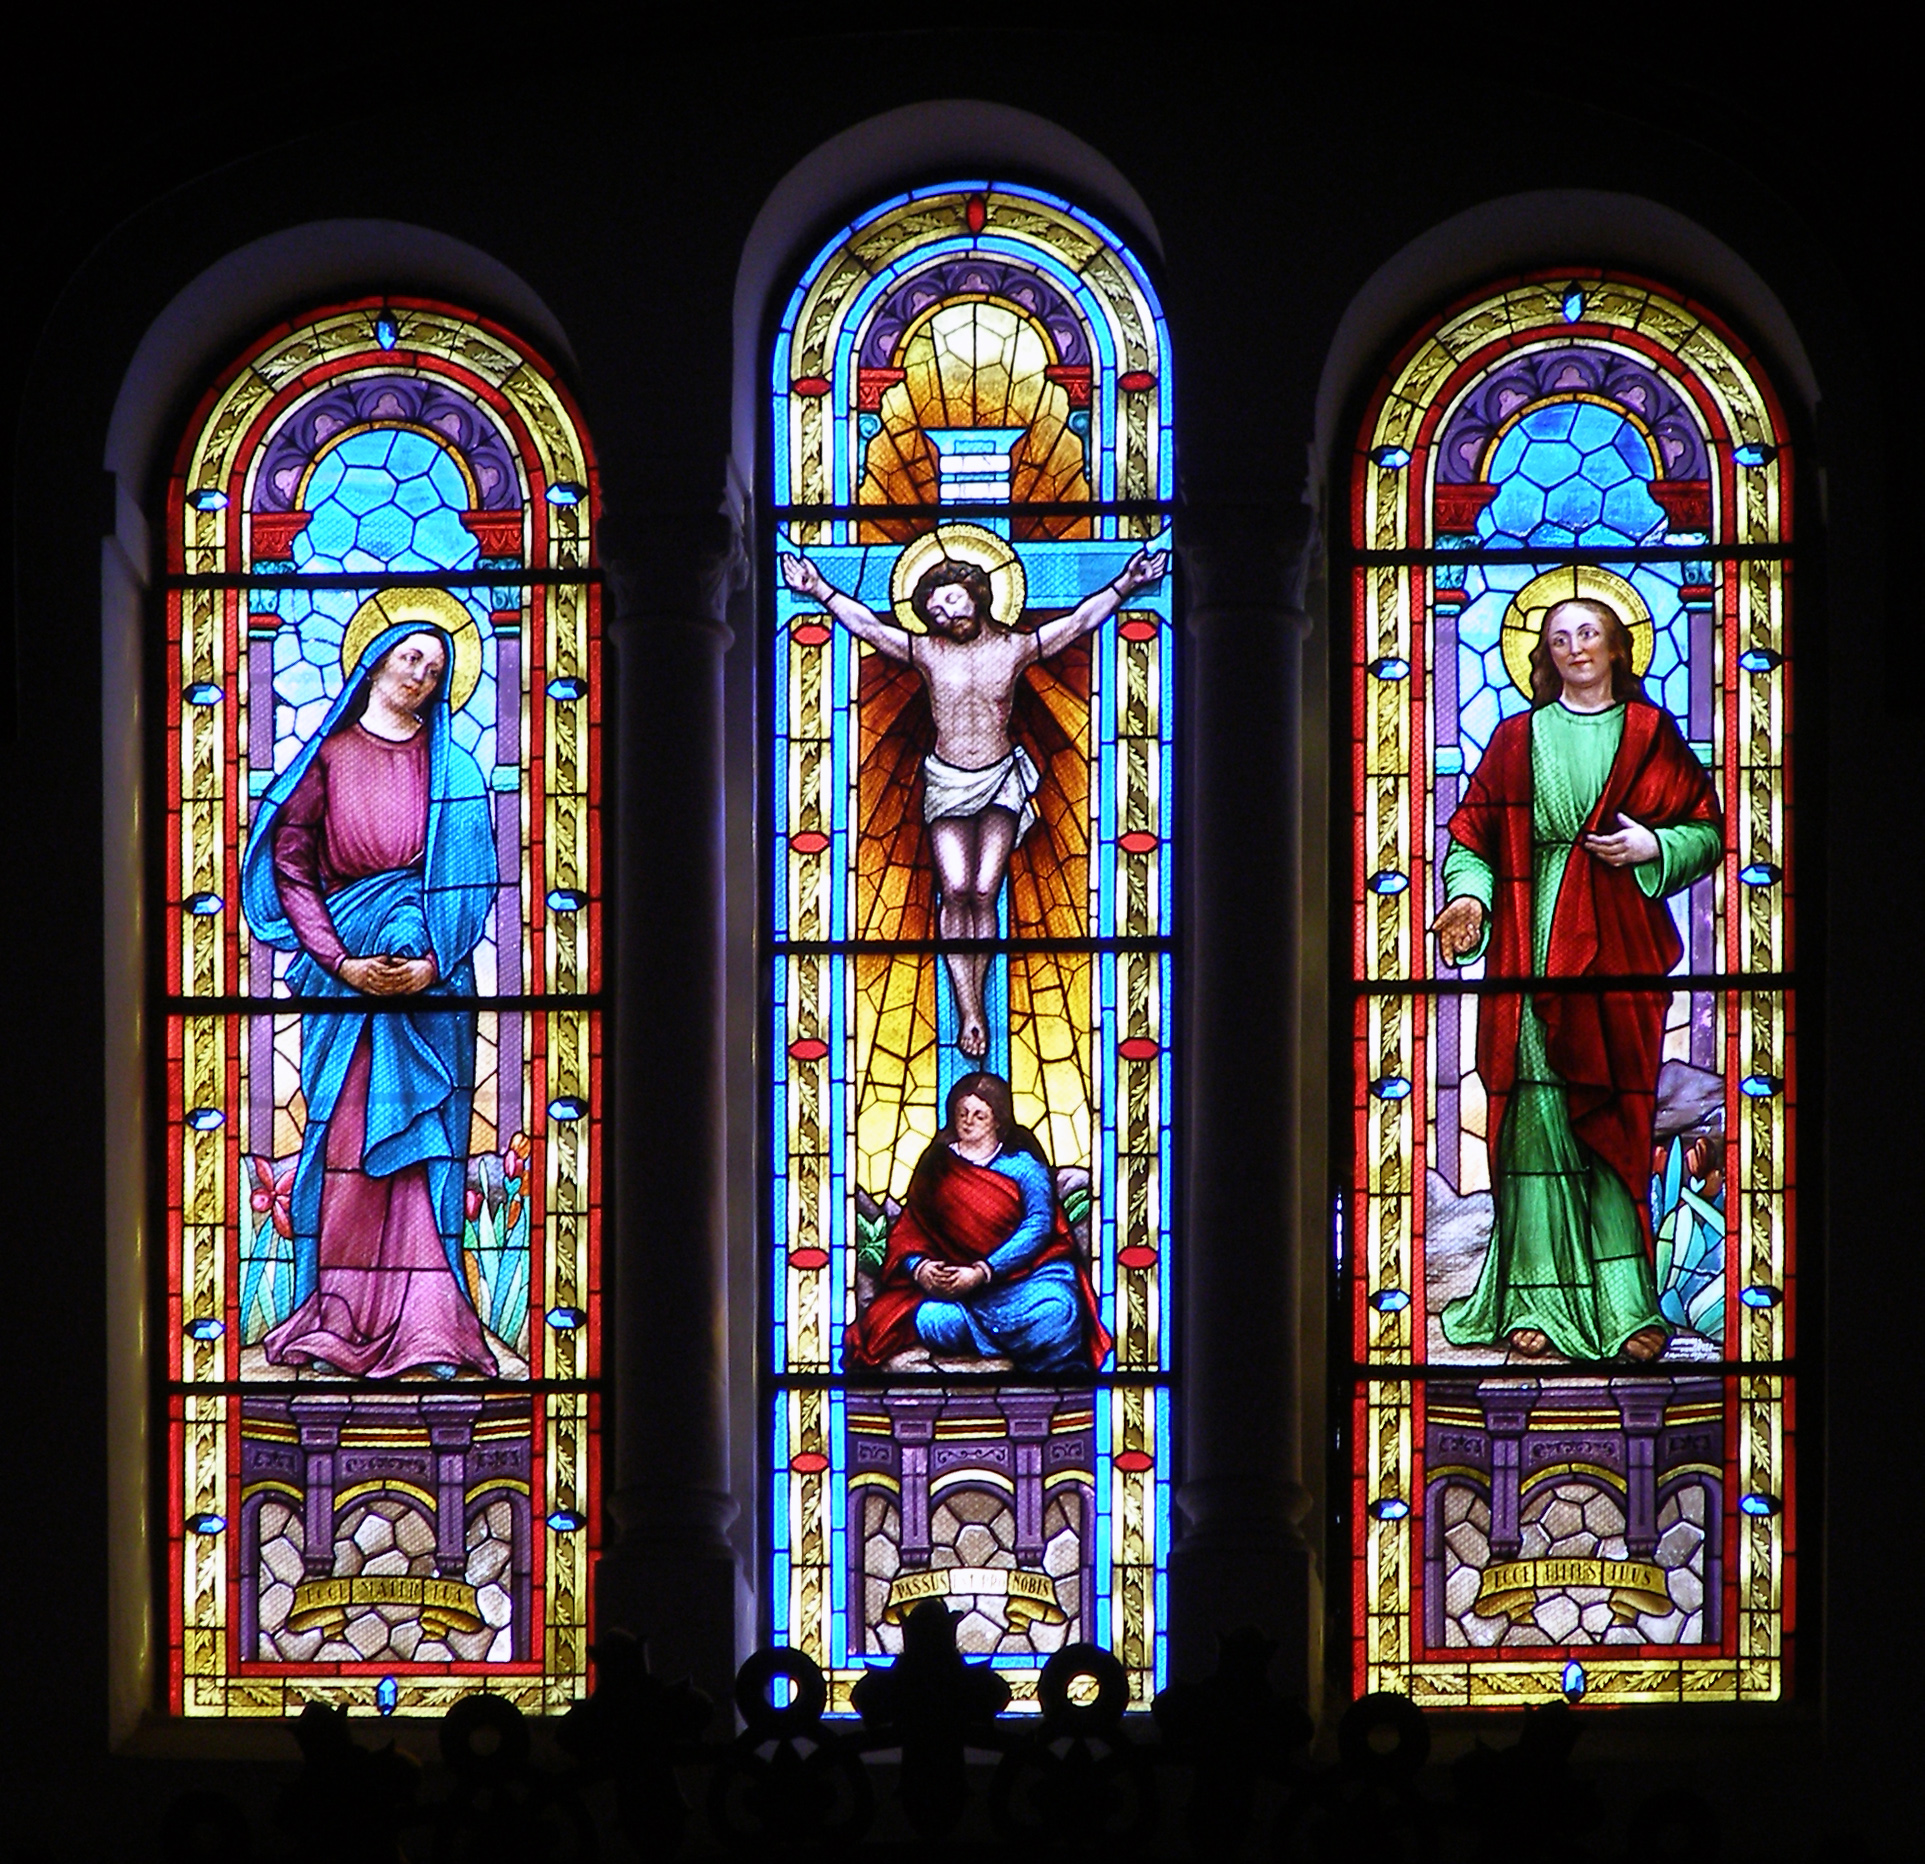 #05A1C6 File:Espinho vitral.jpg Wikimedia Commons 222 Janelas De Vidro Para Igrejas